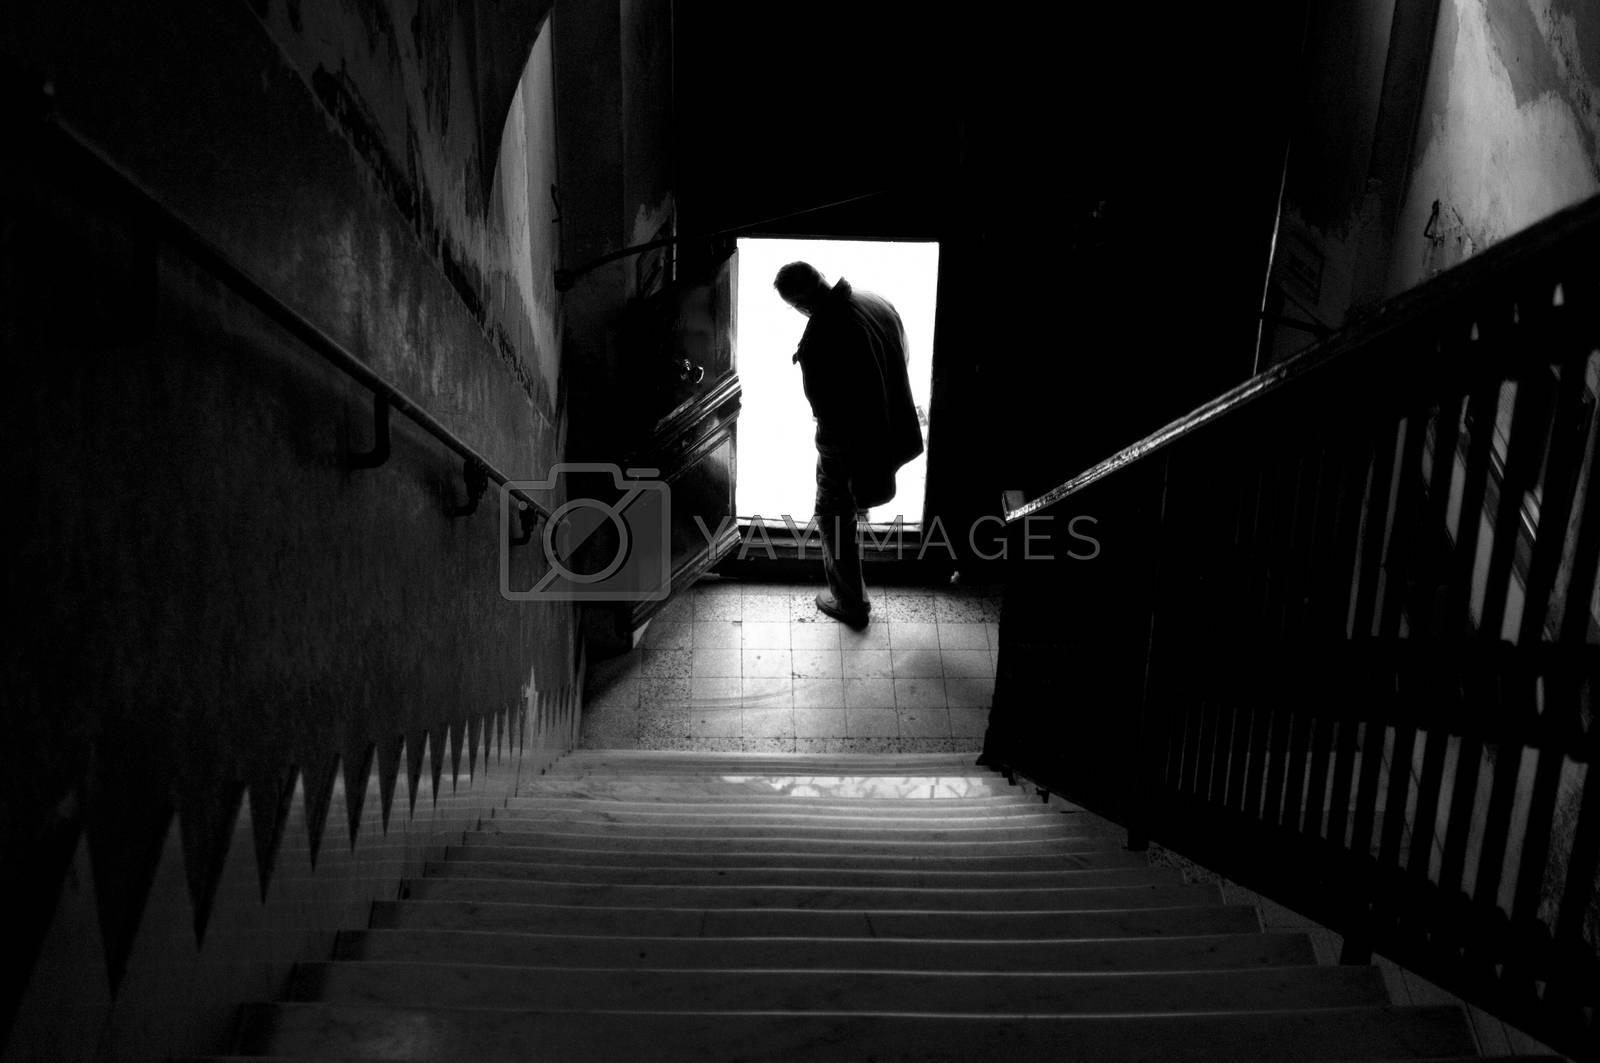 Royalty free image of silhouette by antonio.li